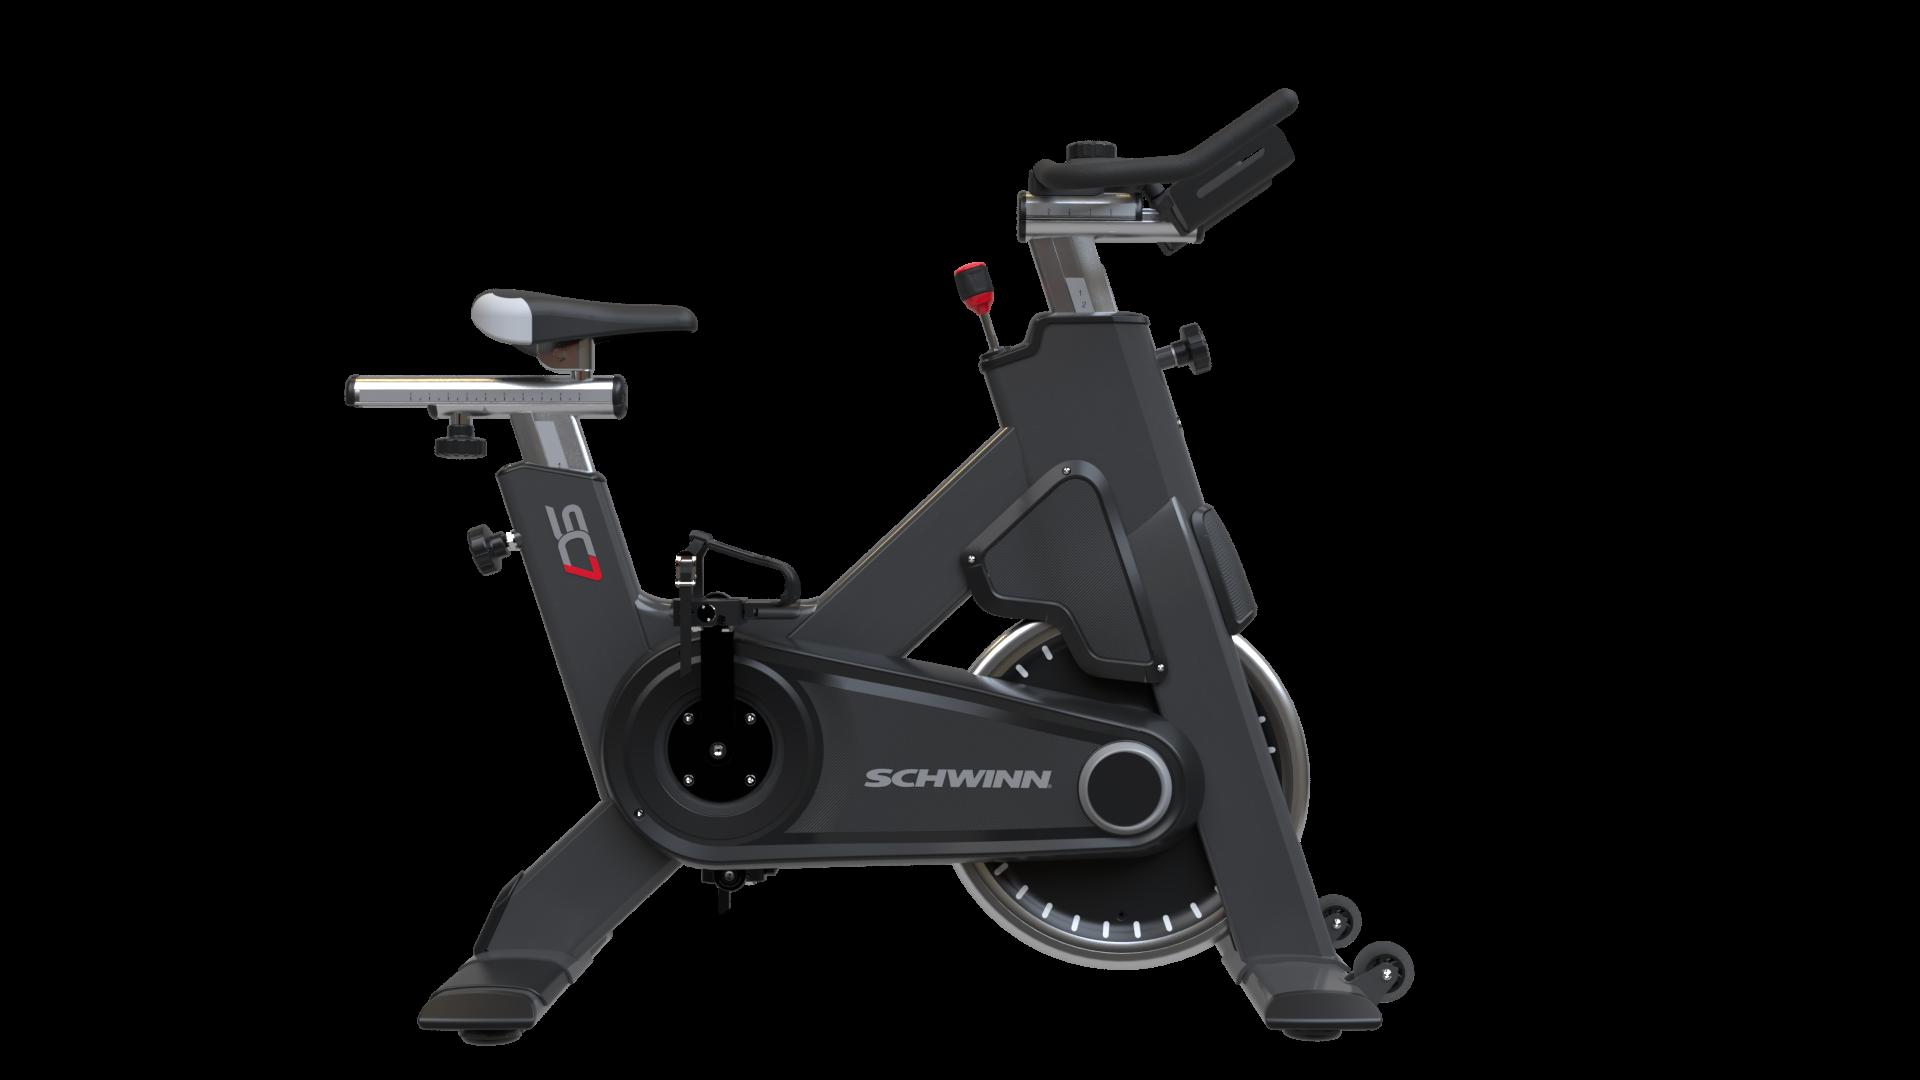 Schwinn SC7 Indoor Bike